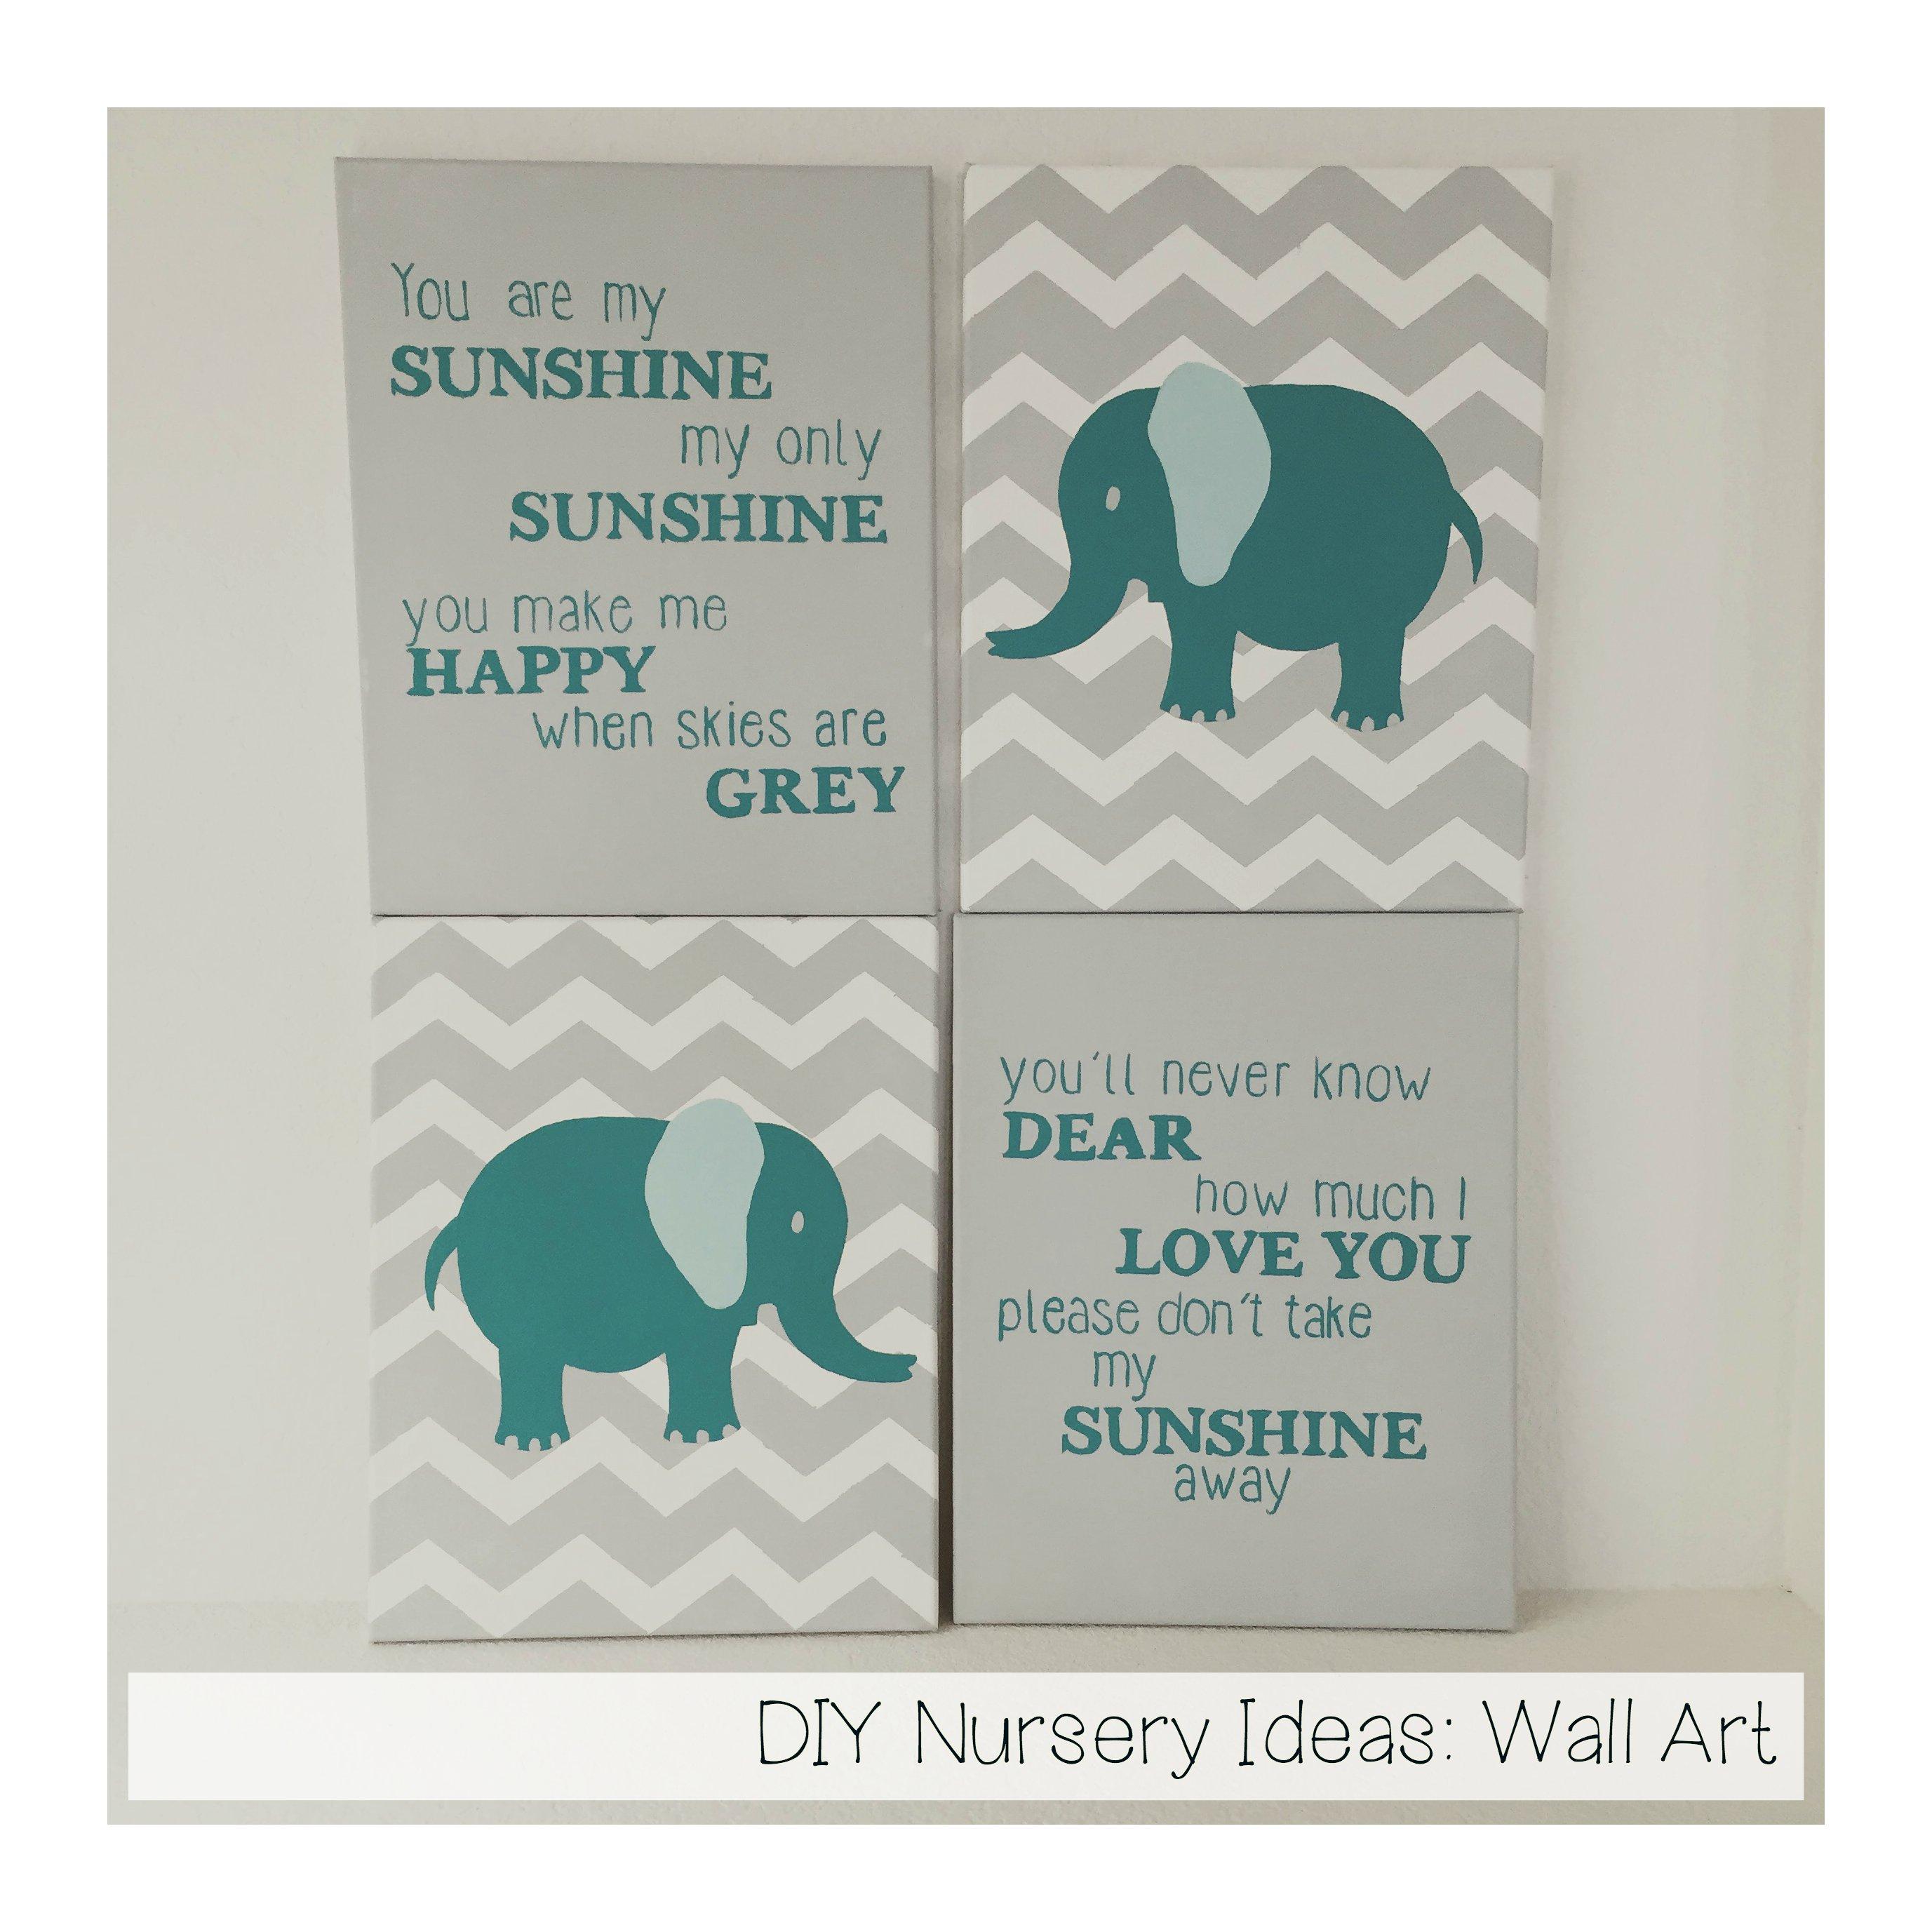 Nursery Handmade Ideas: DIY Nursery Ideas: Wall Art